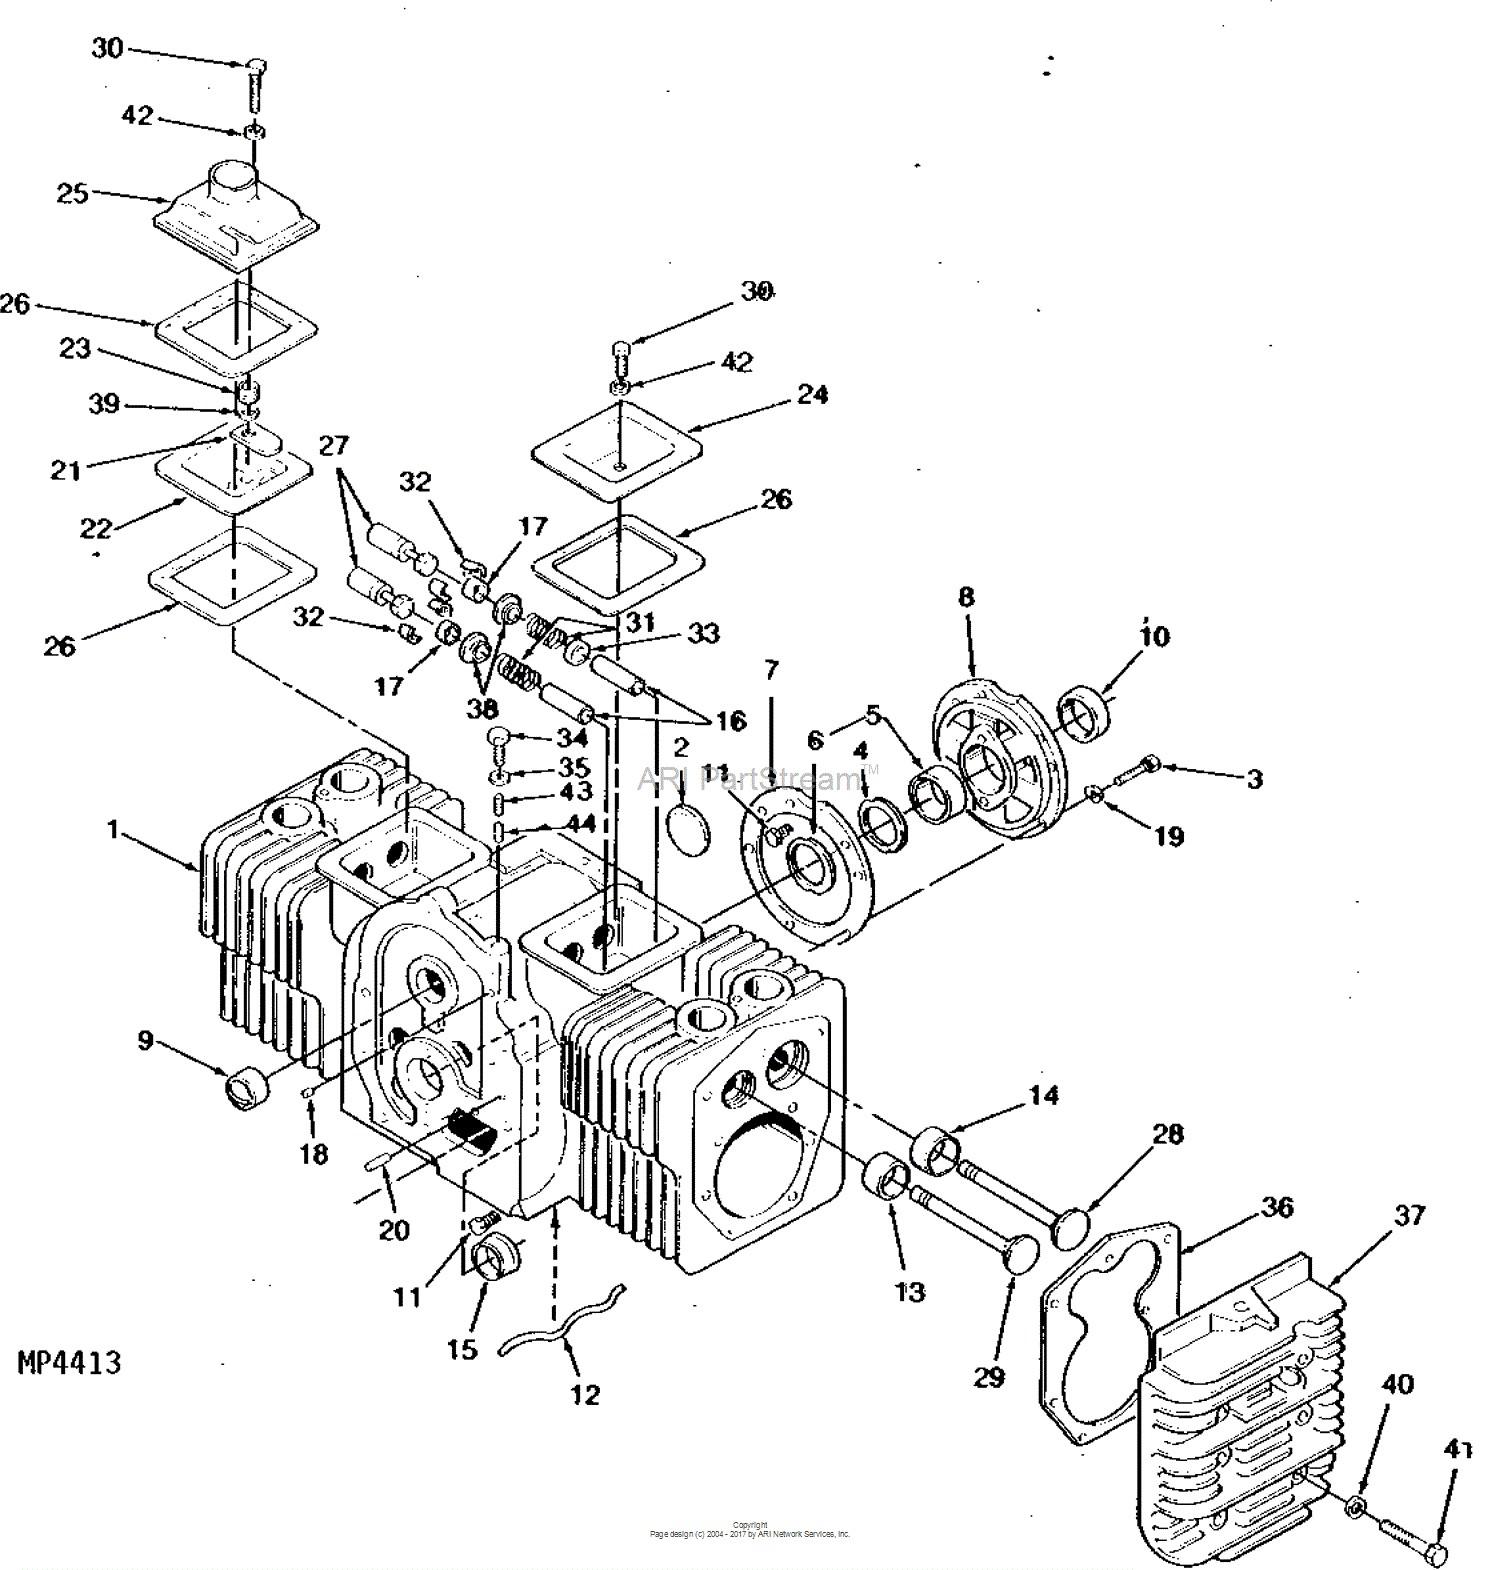 Onan engine parts diagram john deere parts diagrams john deere 317 rh detoxicrecenze lawn tractor